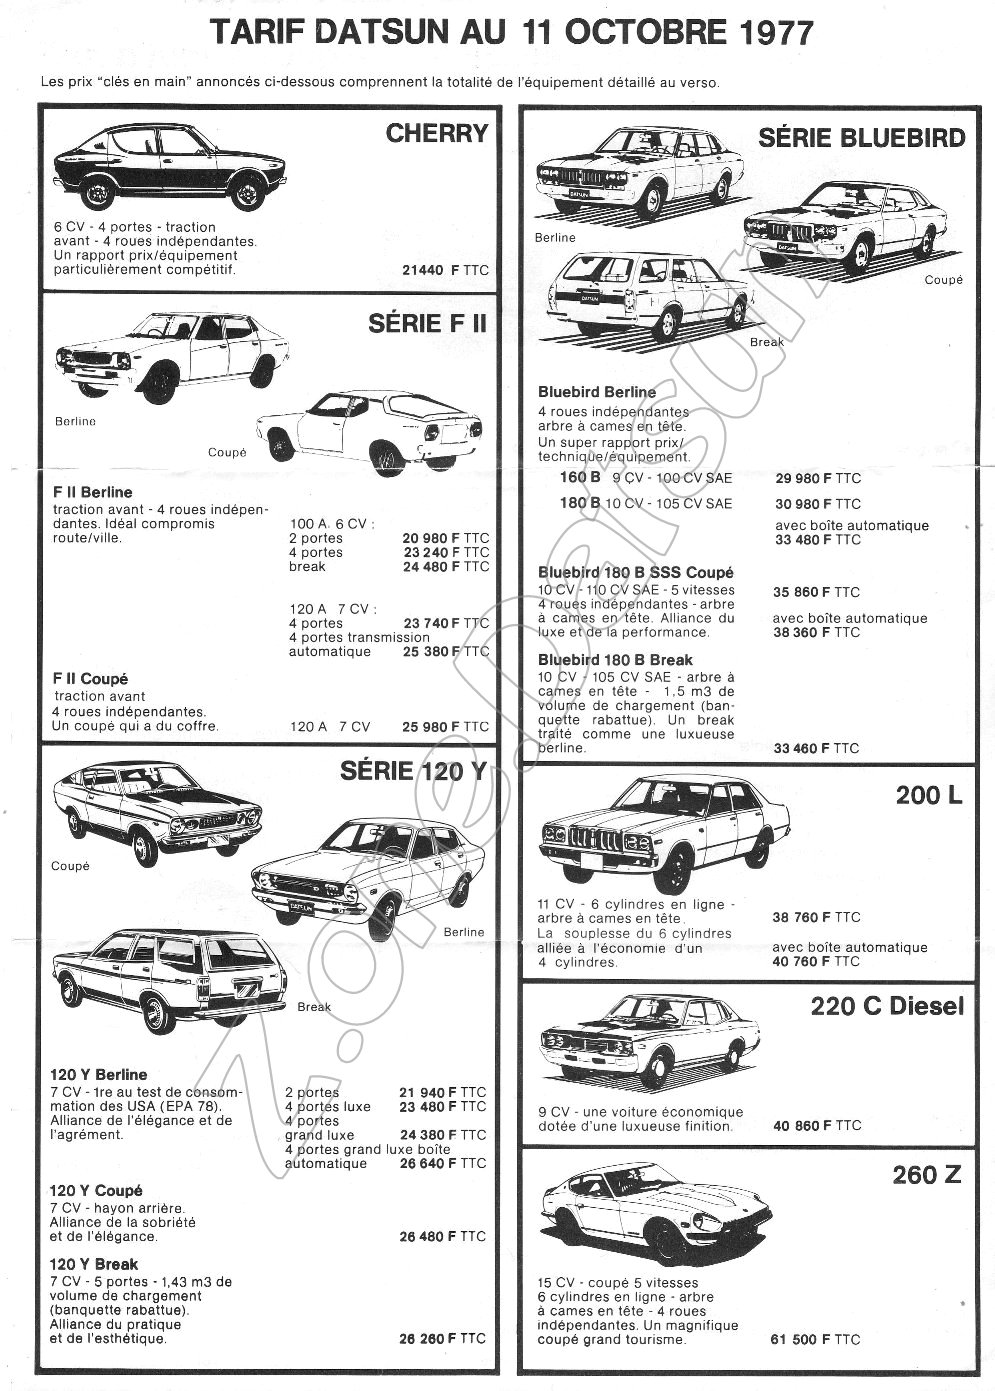 TARIF DATSUN FRANCE de 1969 – A 1984. – Z.ONE